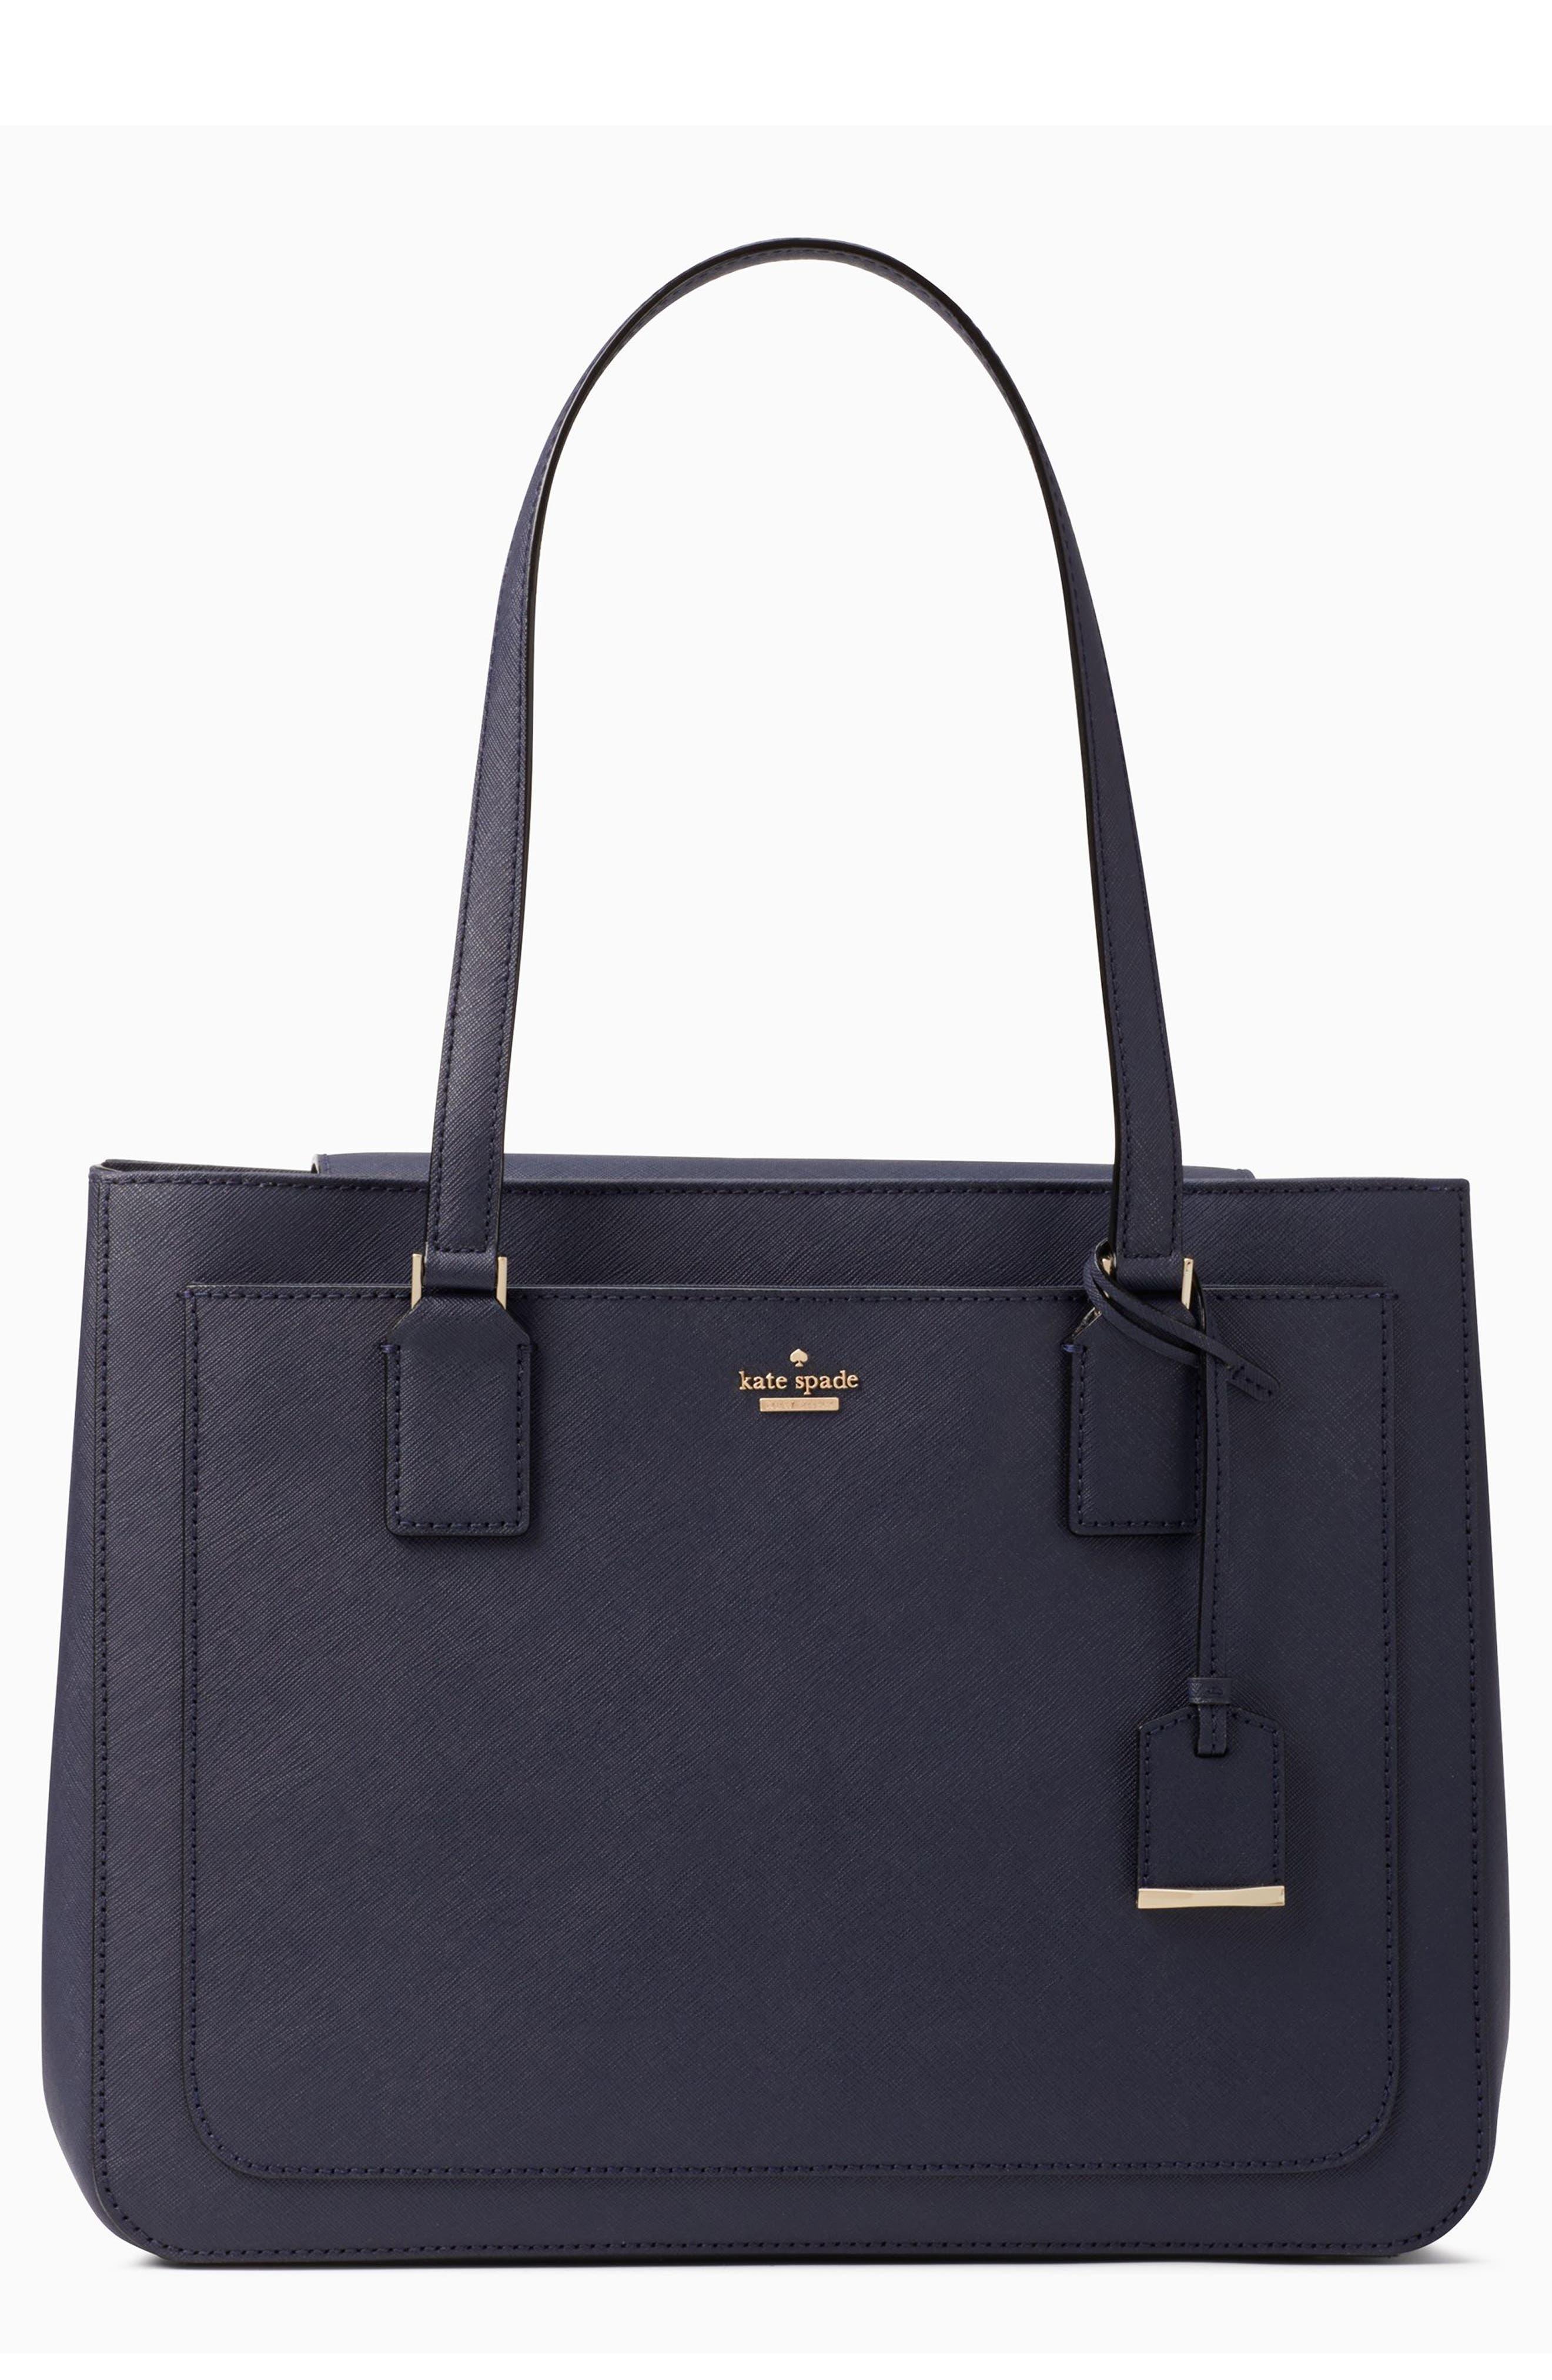 cameron street - zooey leather tote,                             Main thumbnail 1, color,                             Blazer Blue/ Tusk/ Black